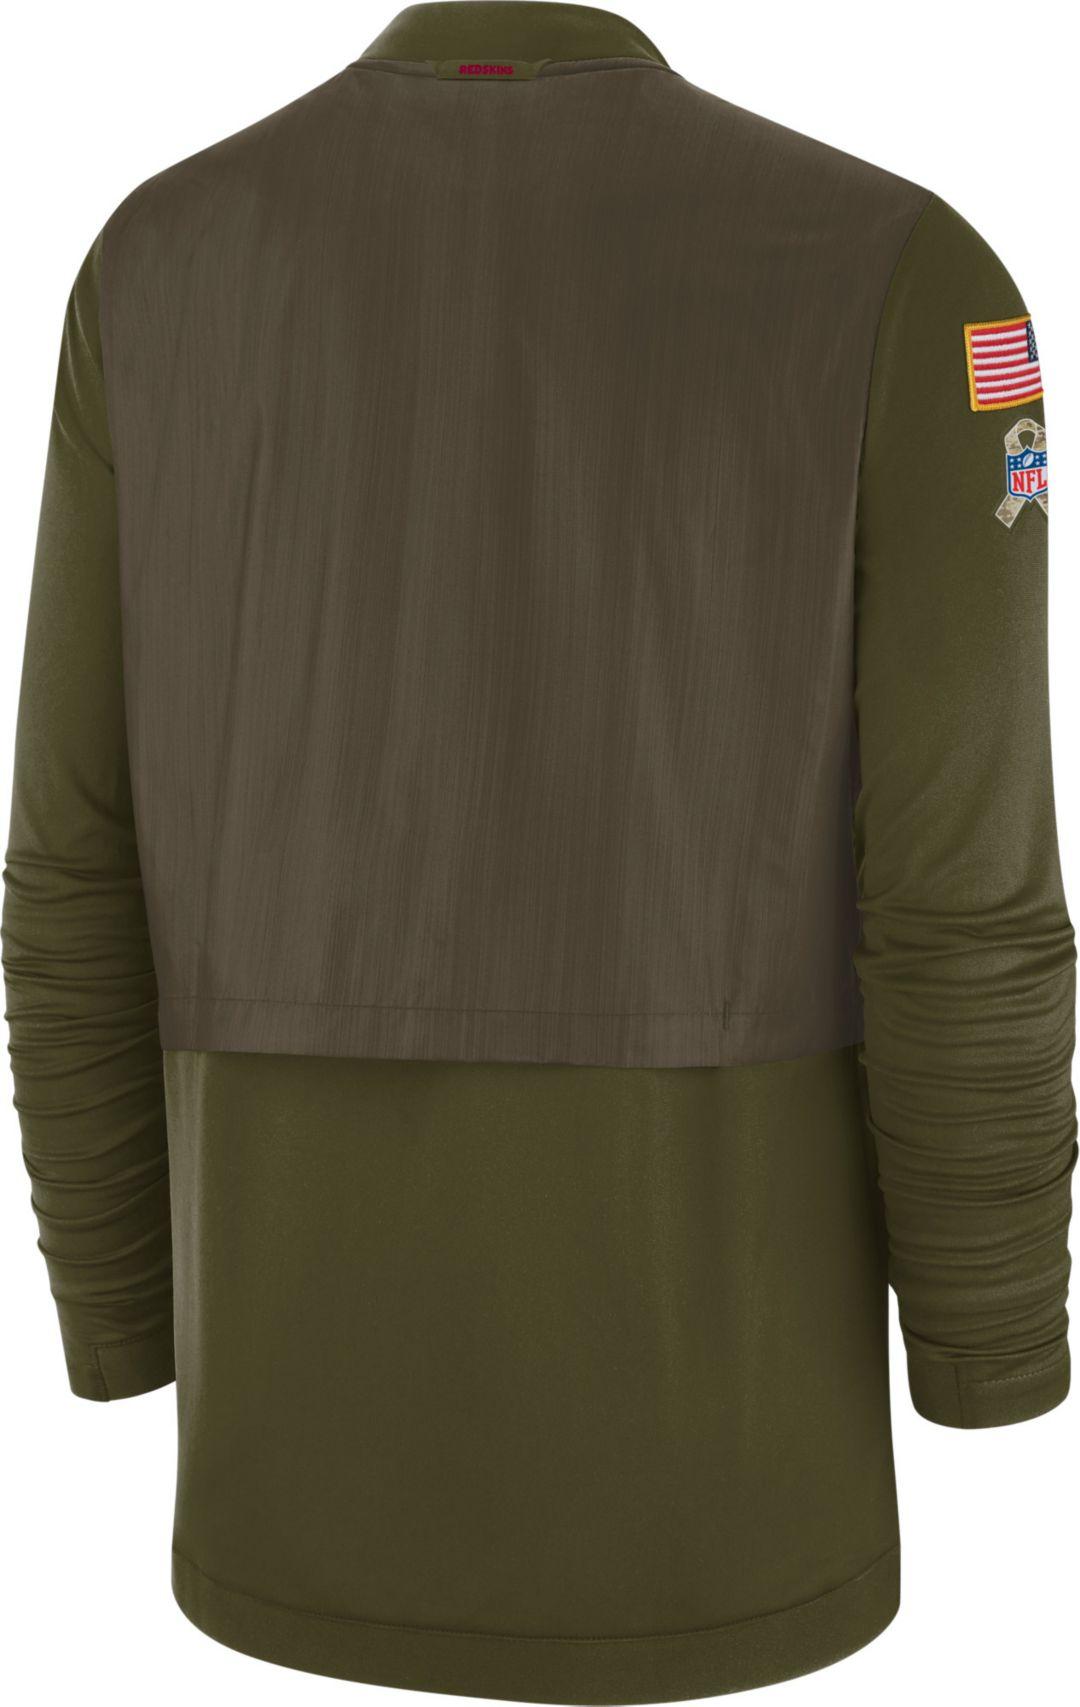 meet cc986 c6e30 Nike Men's Salute to Service Washington Redskins Hybrid Full-Zip Jacket